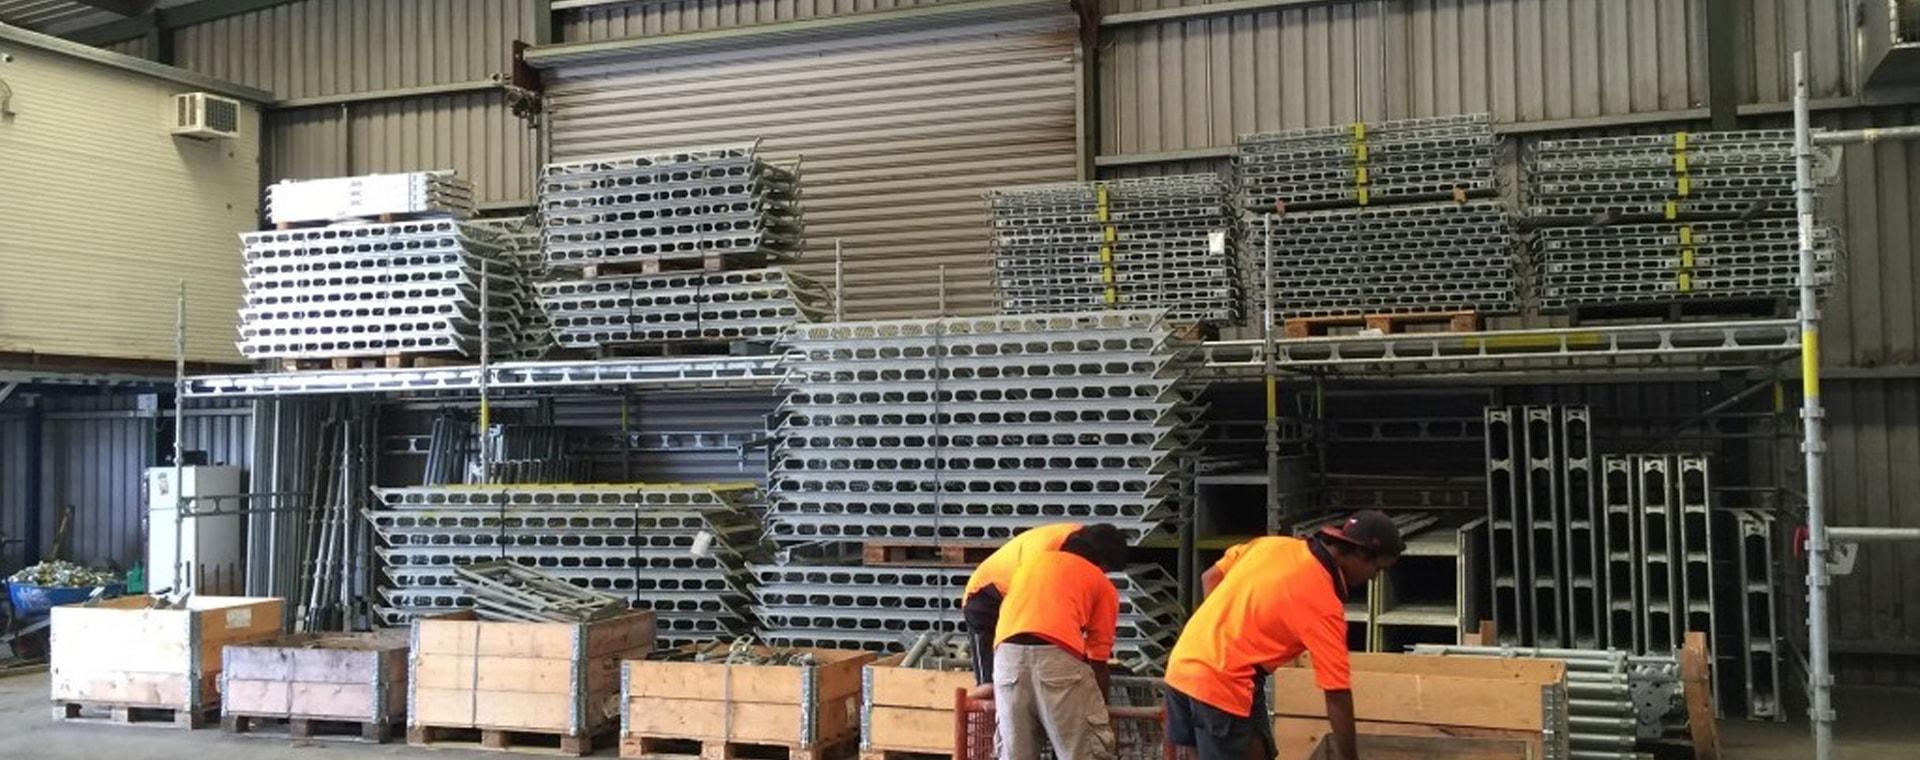 Brickwork and Scaffold Australia